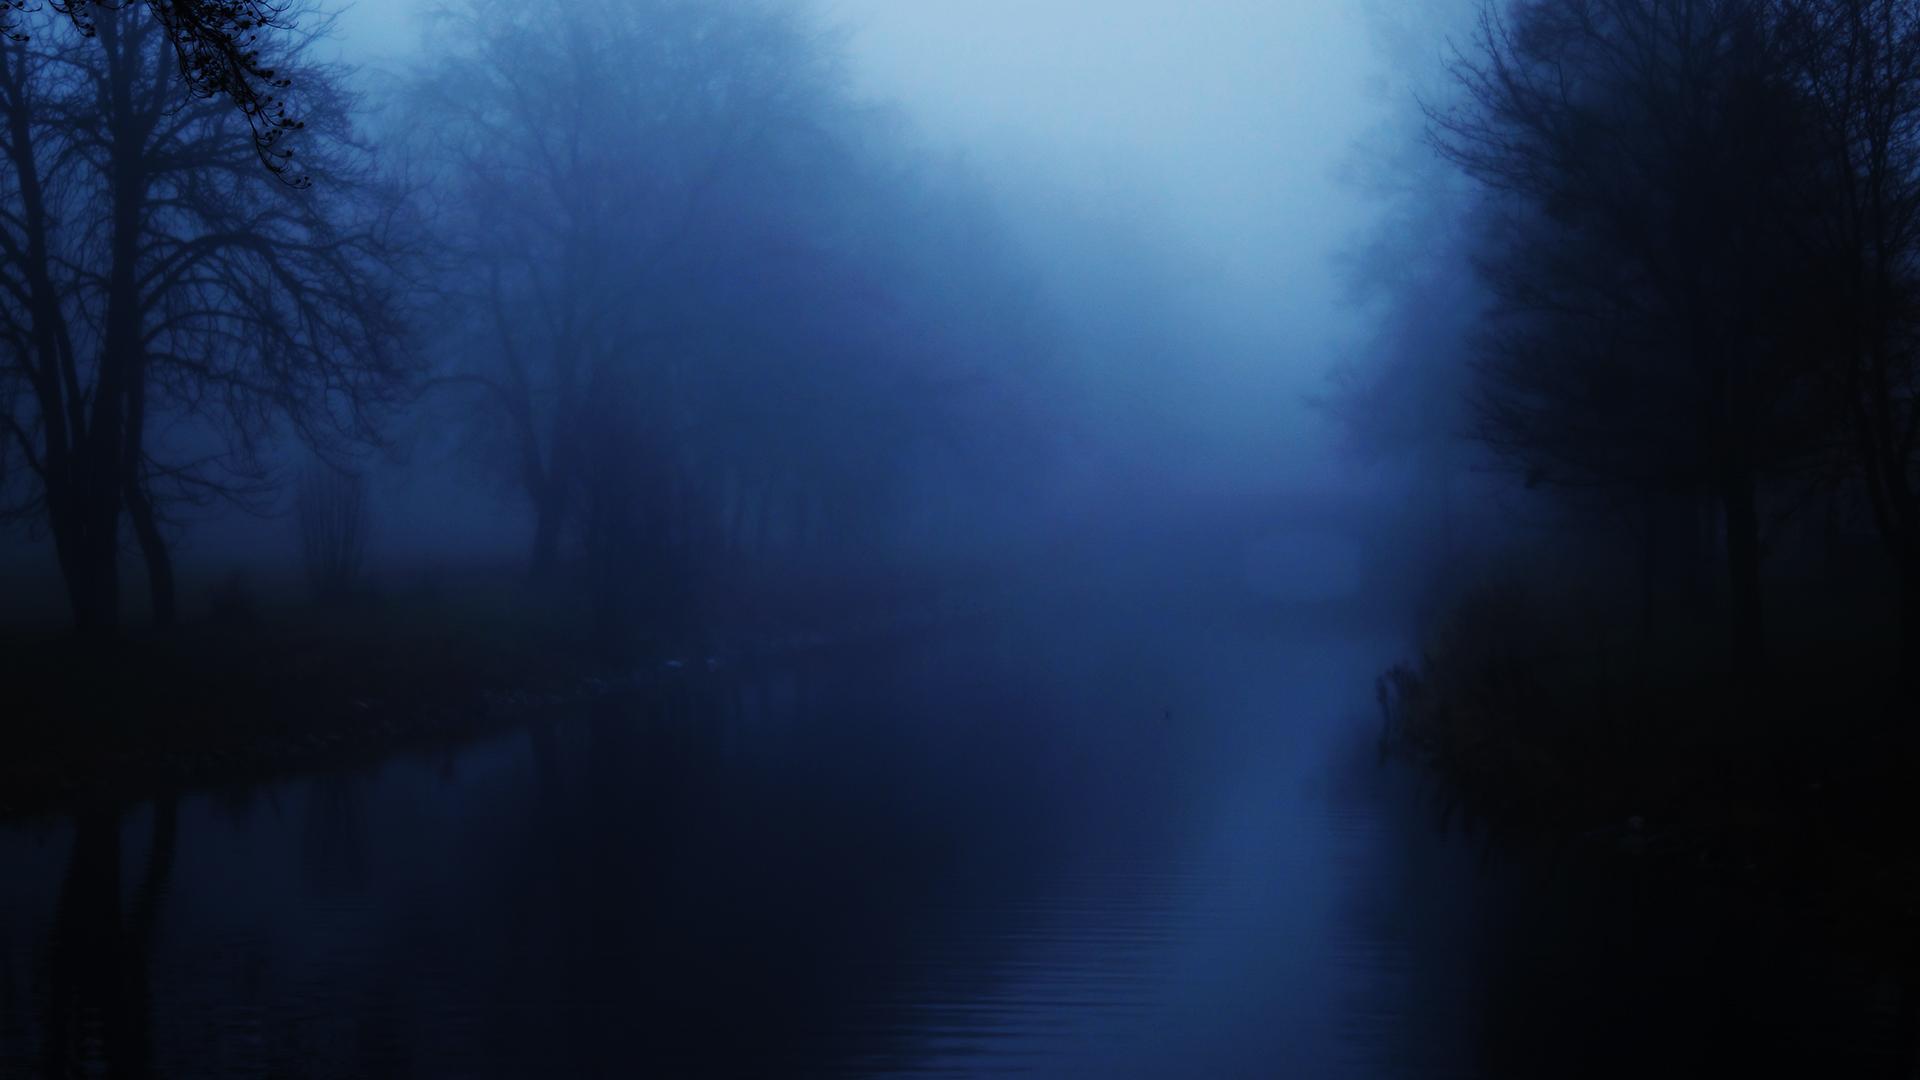 Синие туманы картинки